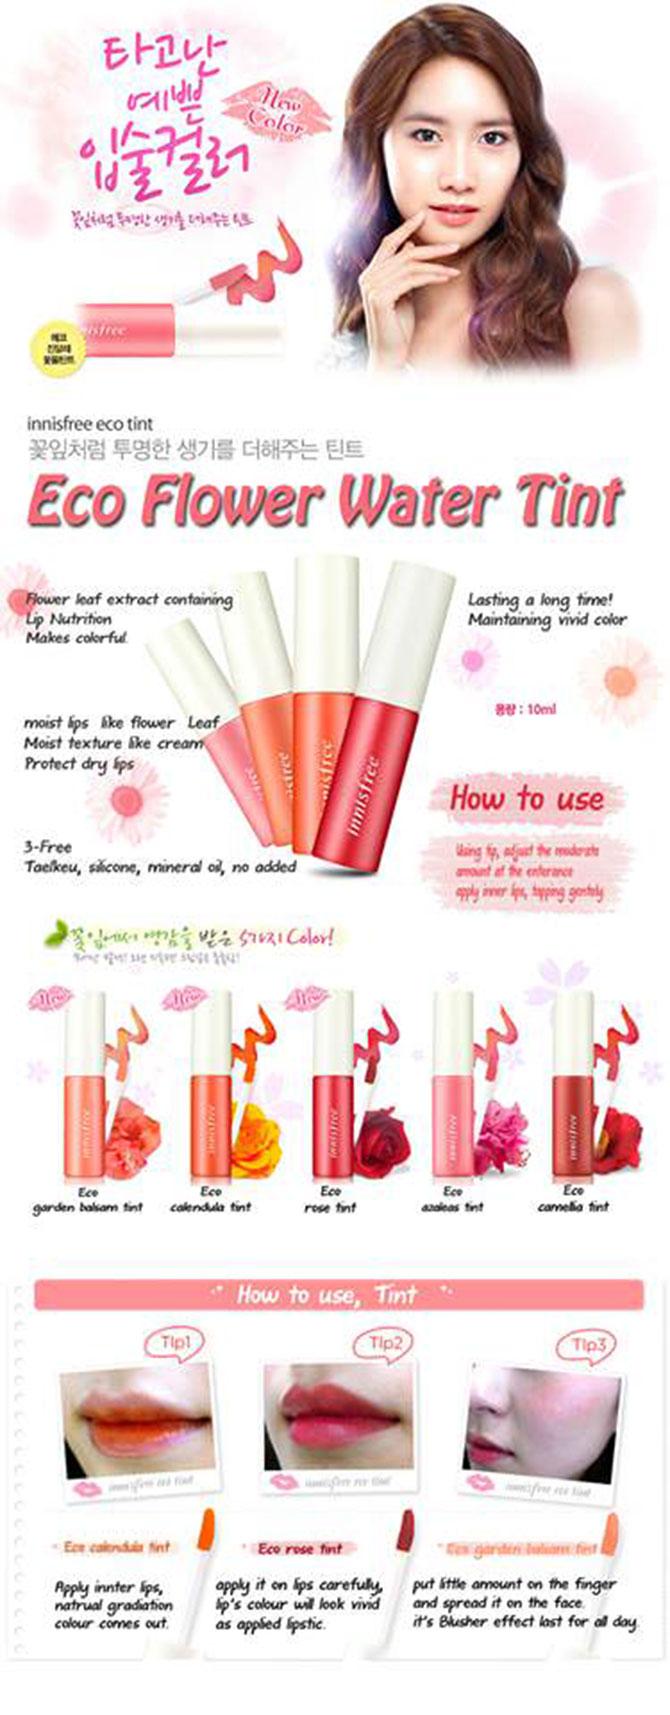 Son dưỡng Innisfree Eco Flower Tint Balm